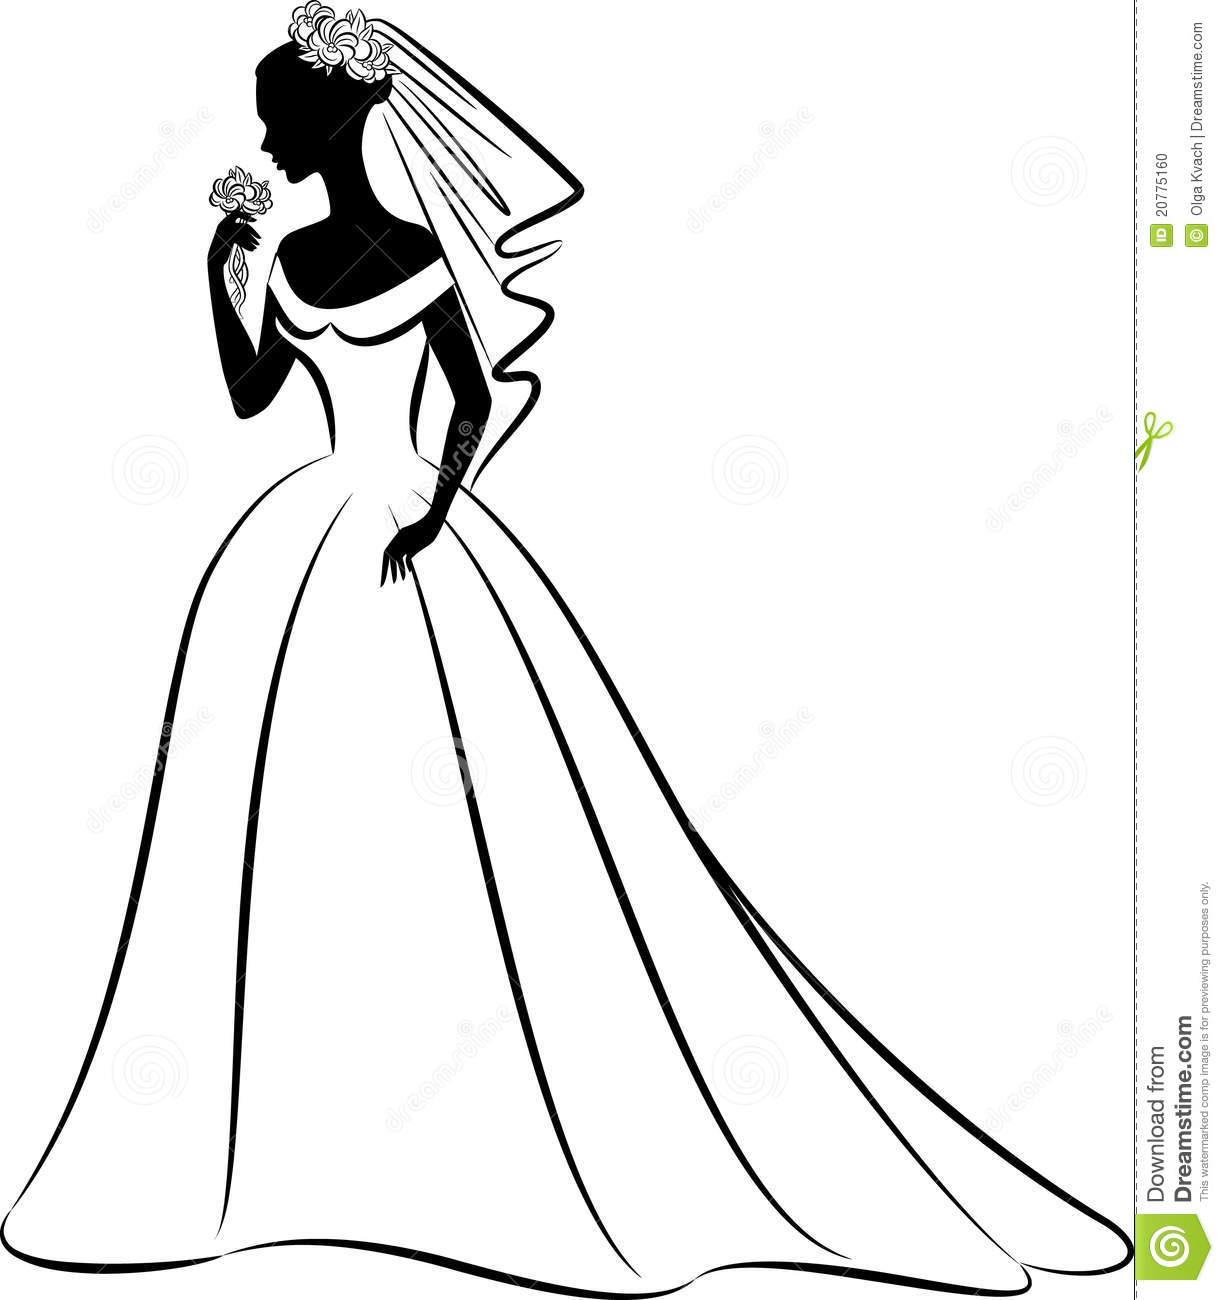 Bride clipart outline. Free bridal png download